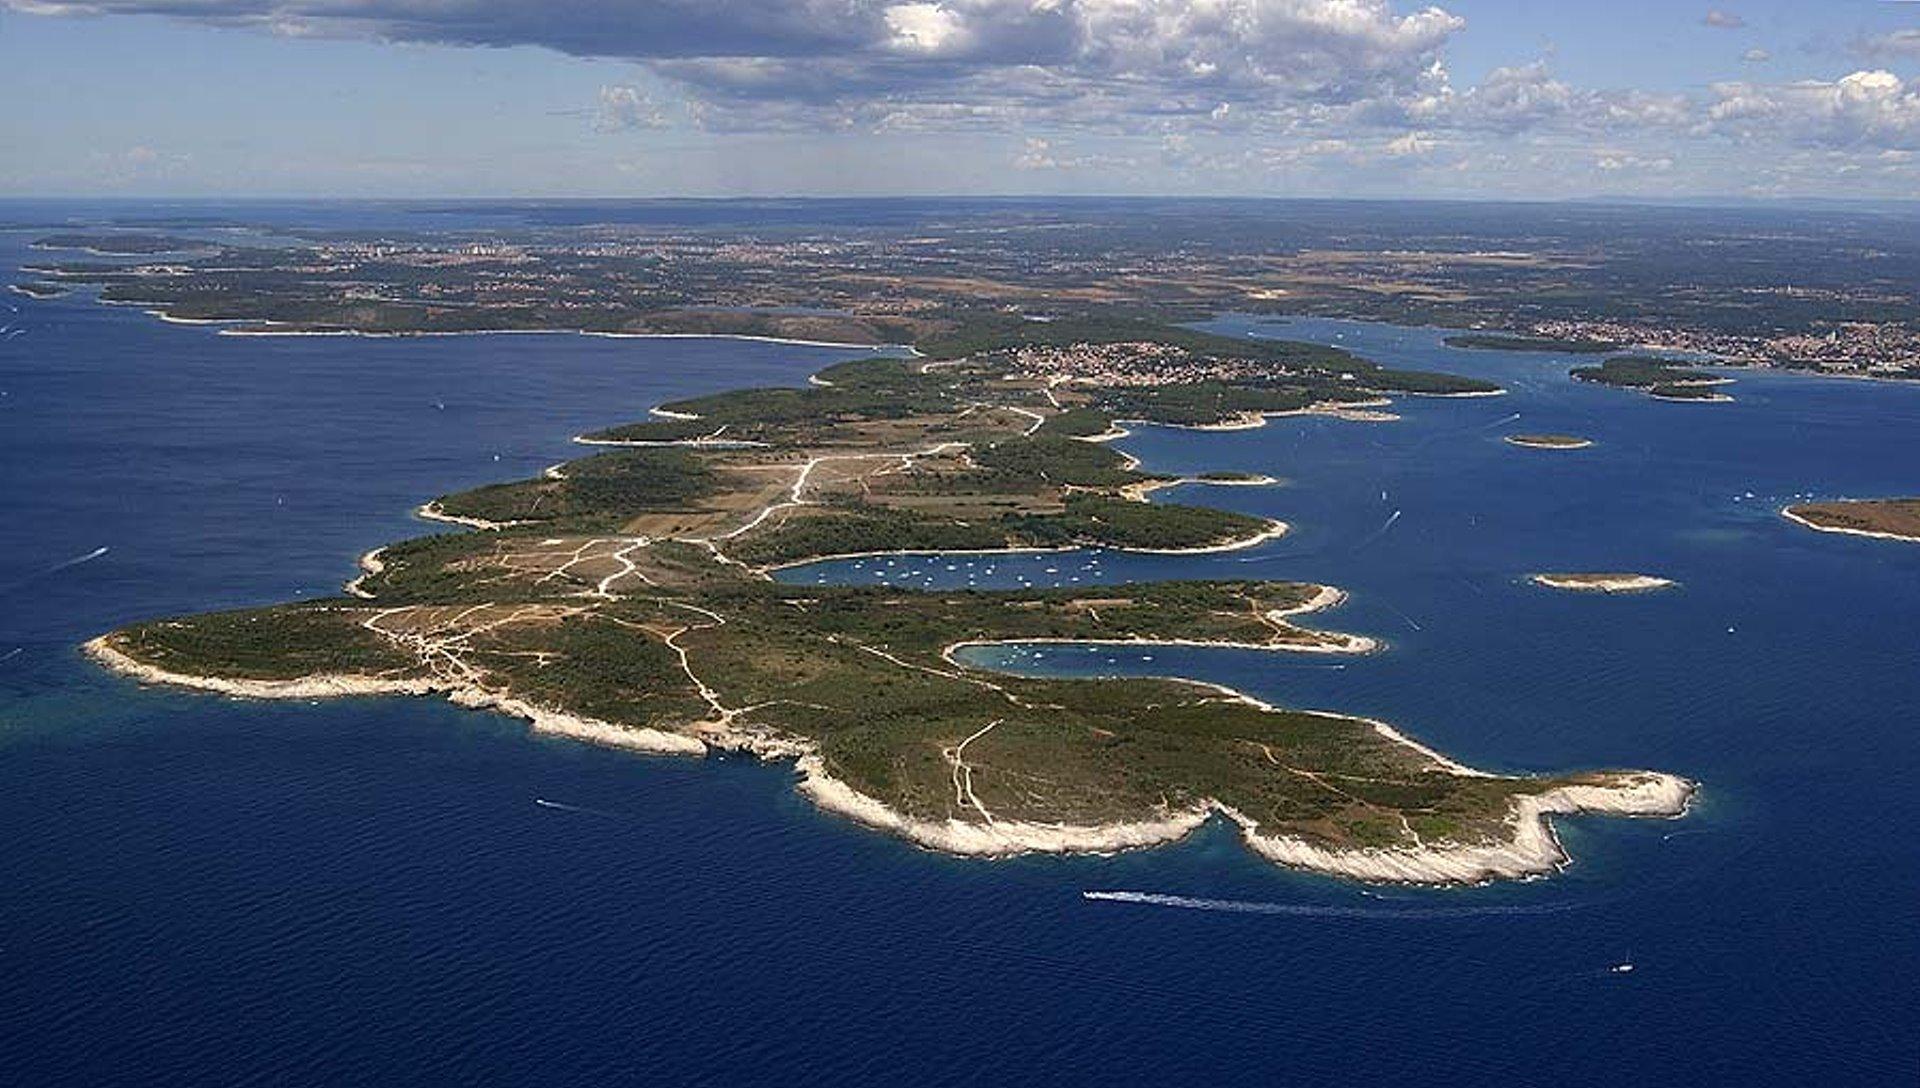 Luoghi d'interesse - Parco naturale Kamenjak